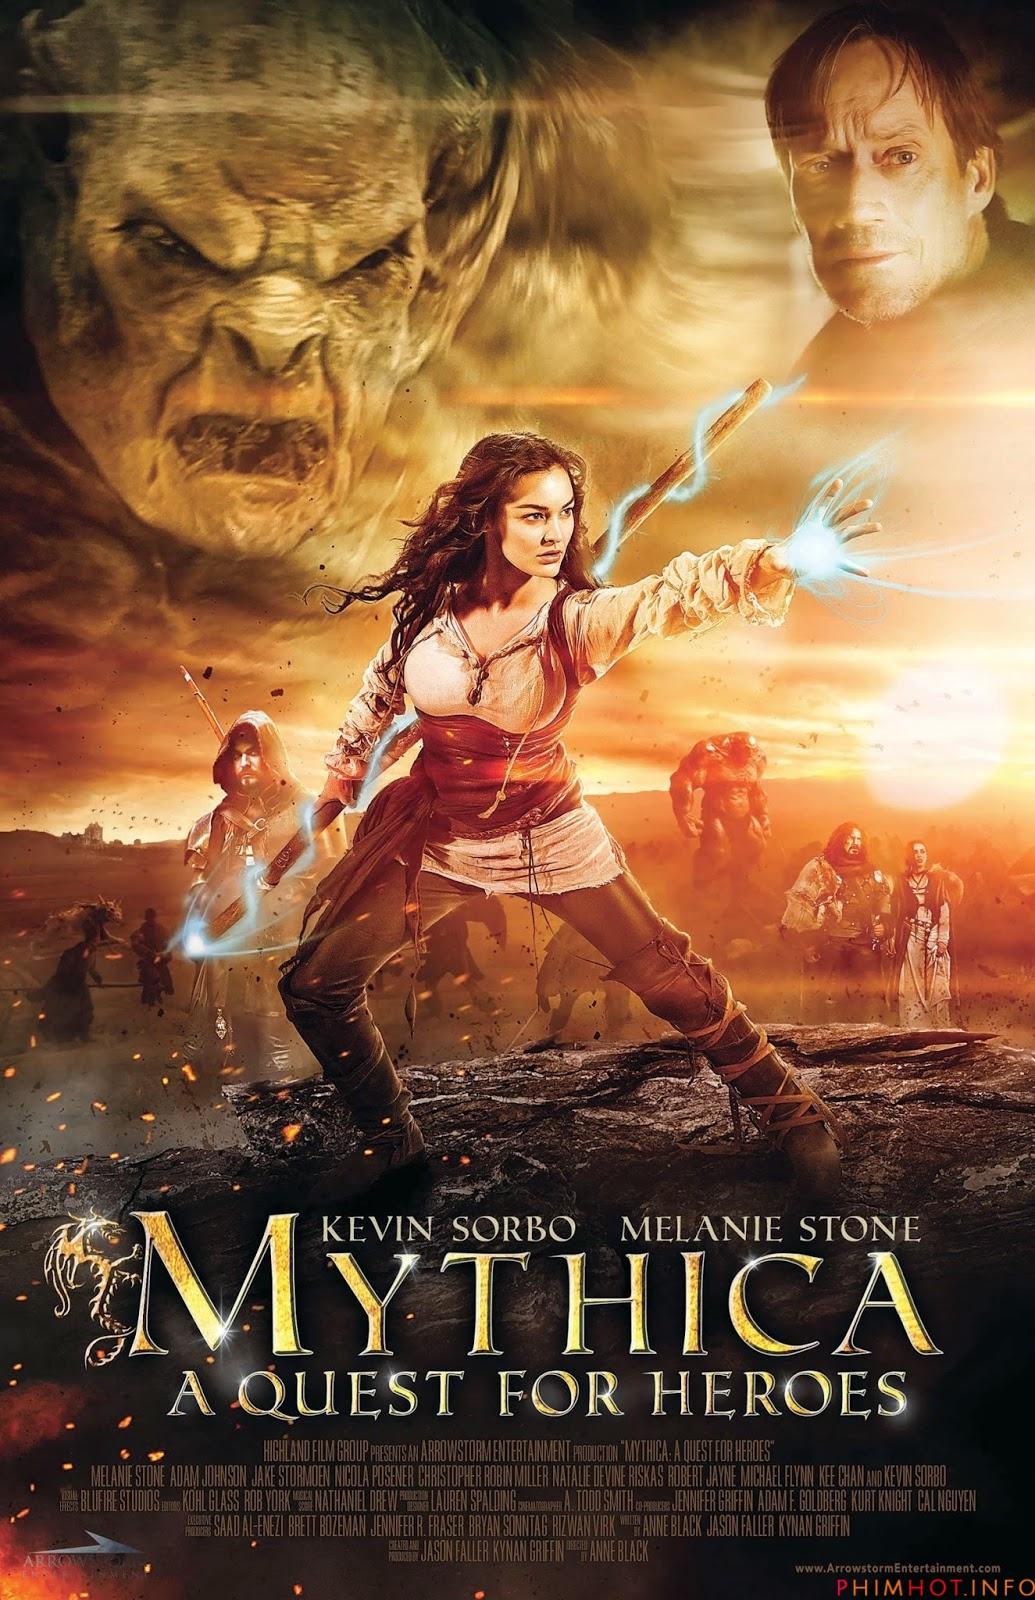 Mythica: A Quest for Heroes ศึกเวทย์มนต์พิทักษ์แดนมหัศจรรย์ [HD][พากย์ไทย]